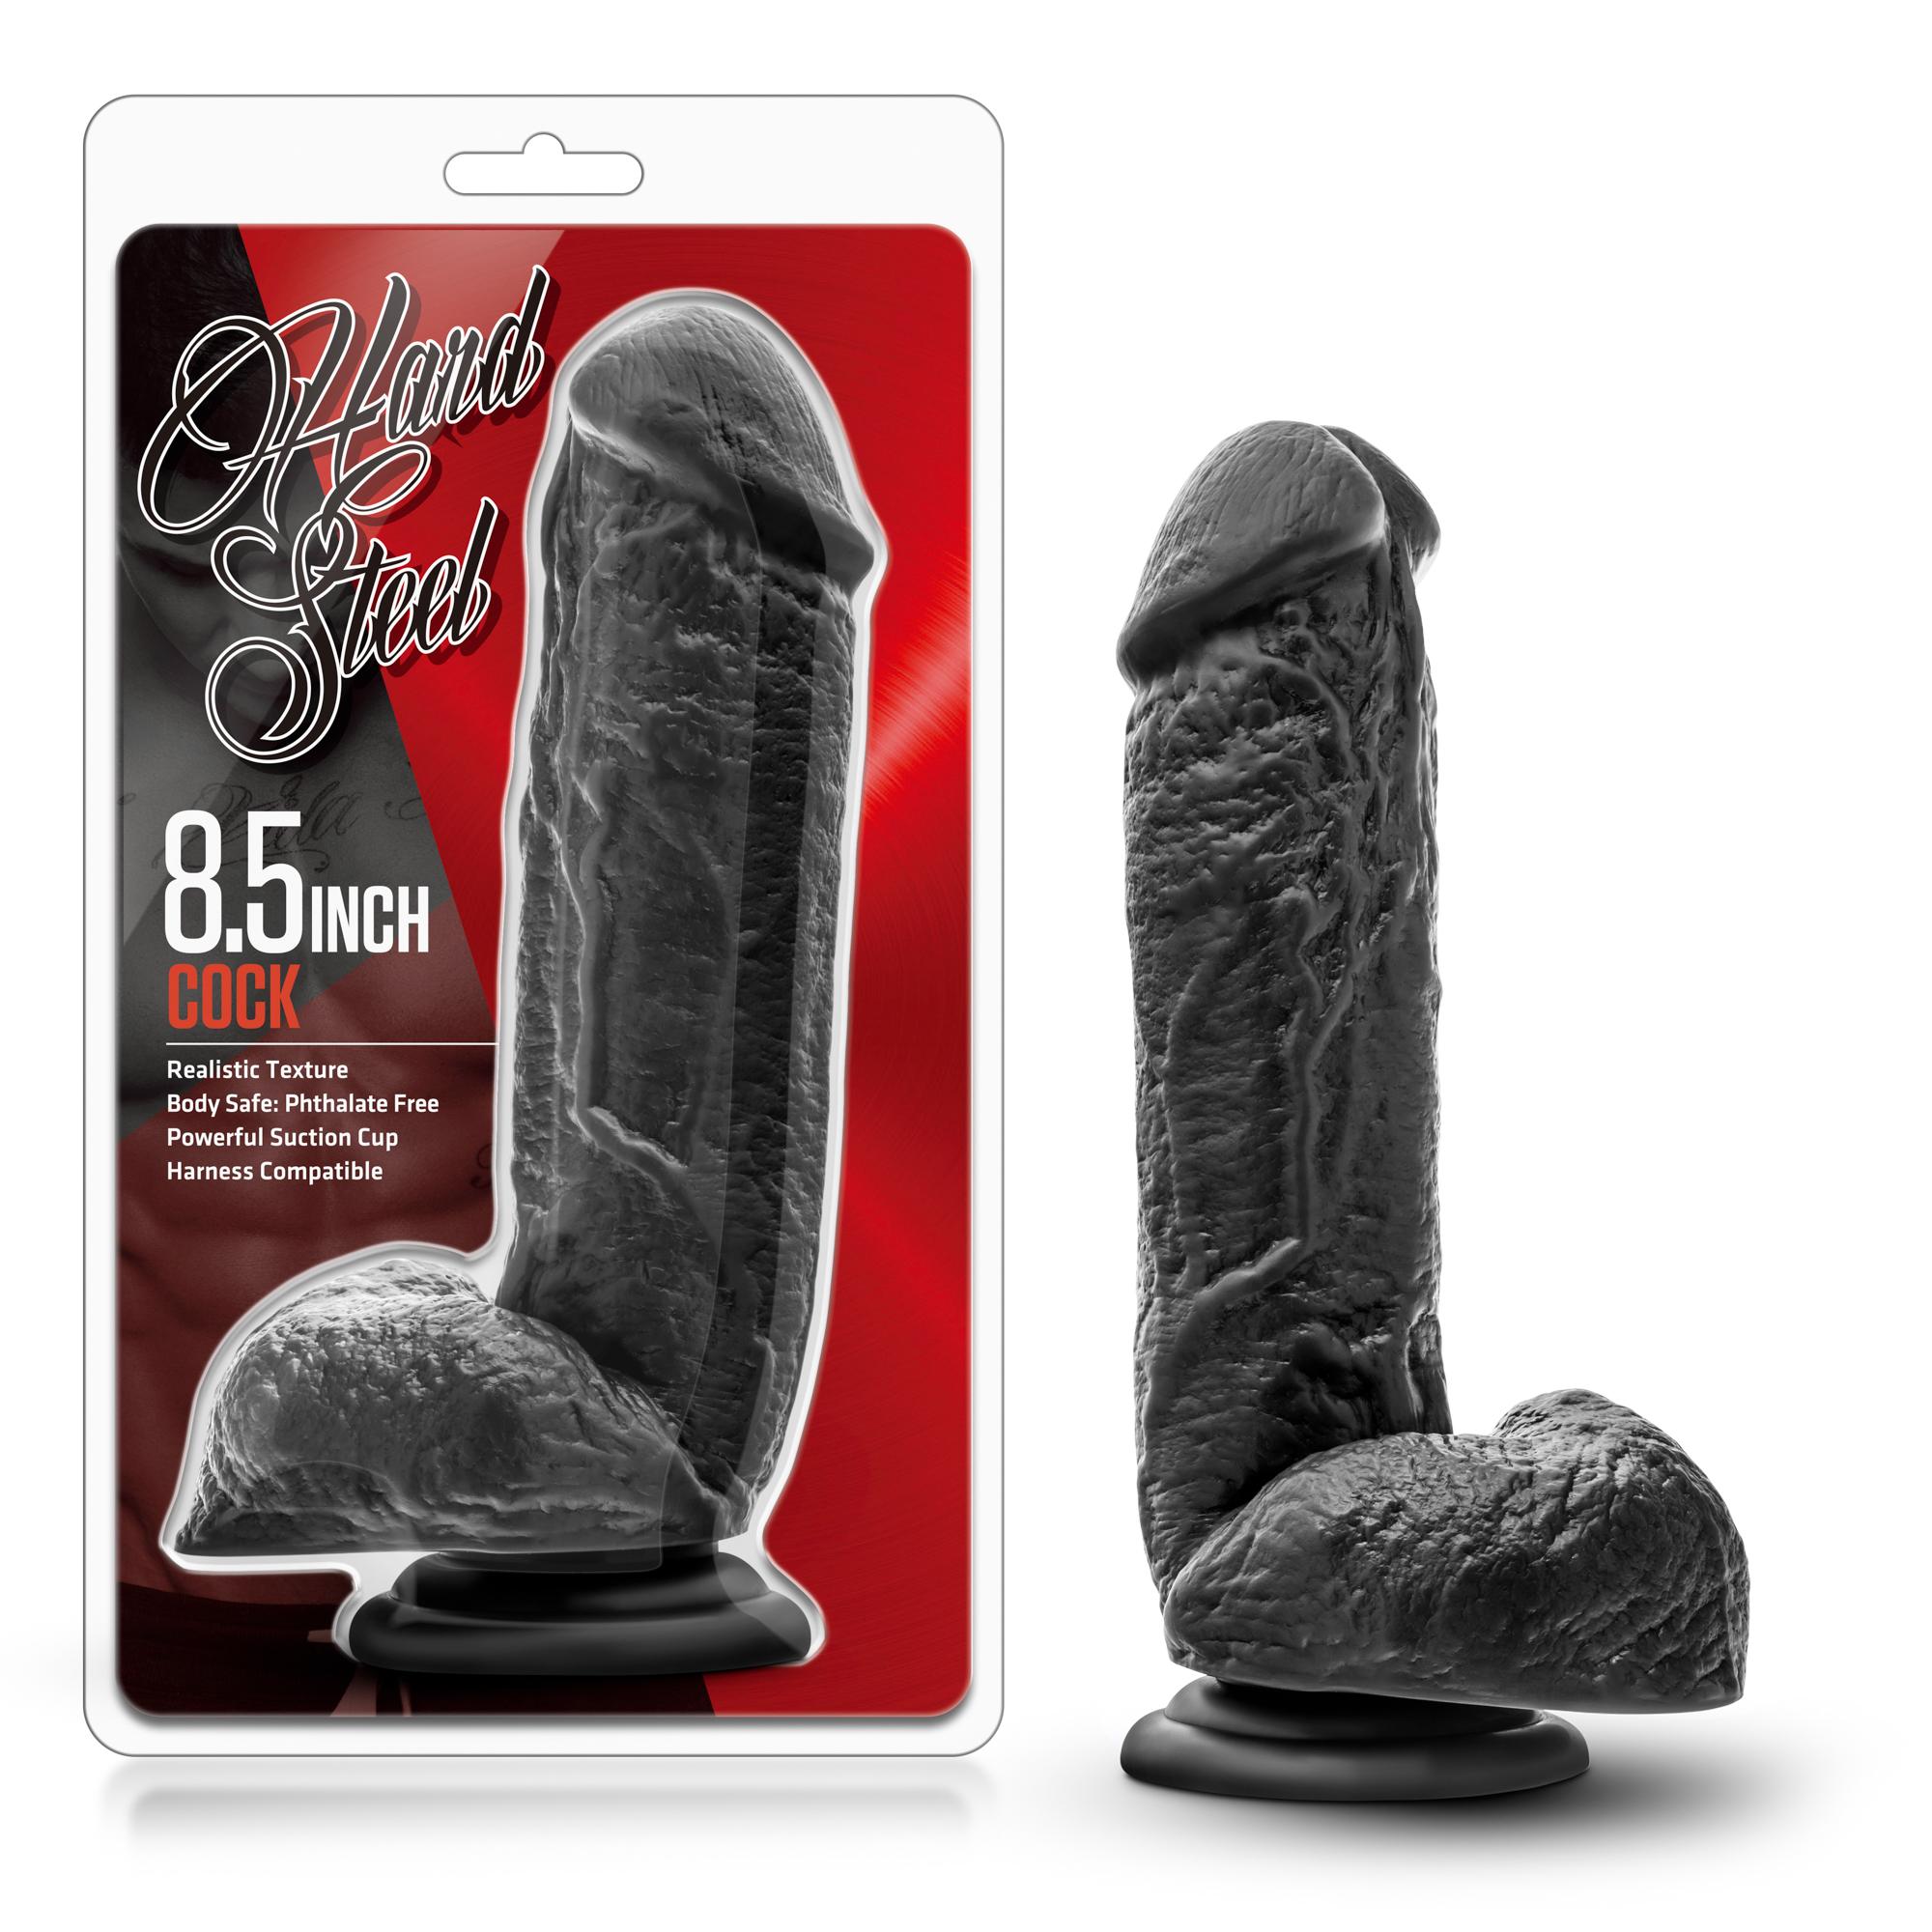 Hard Steel - 8.5 inch Cock - black